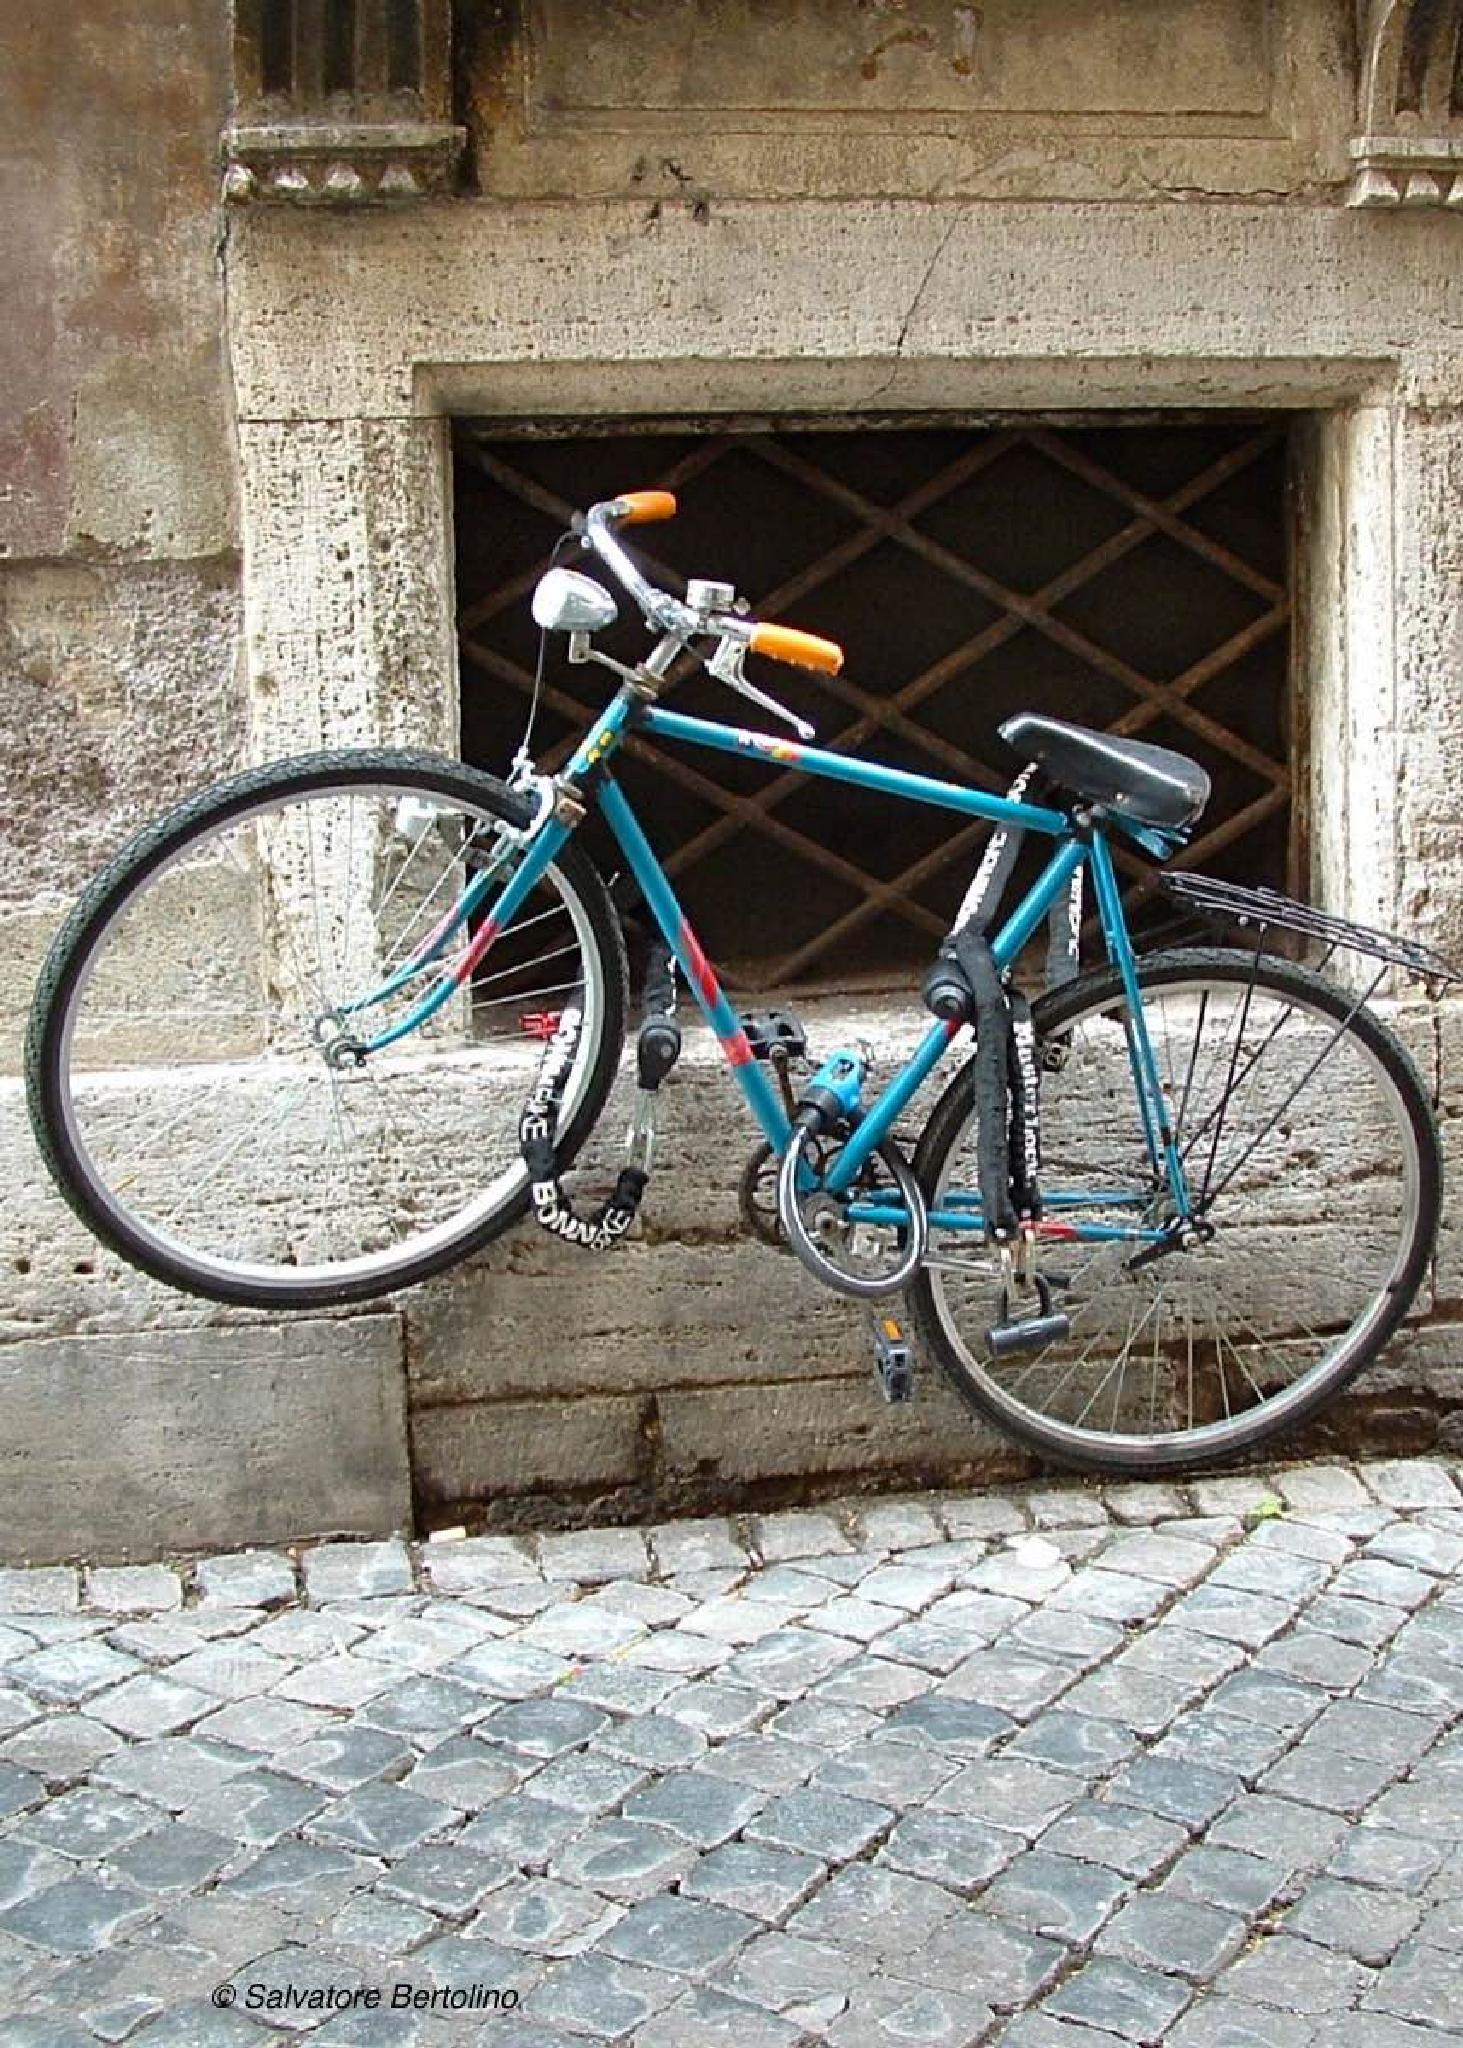 La bici  by Salvatore Bertolino